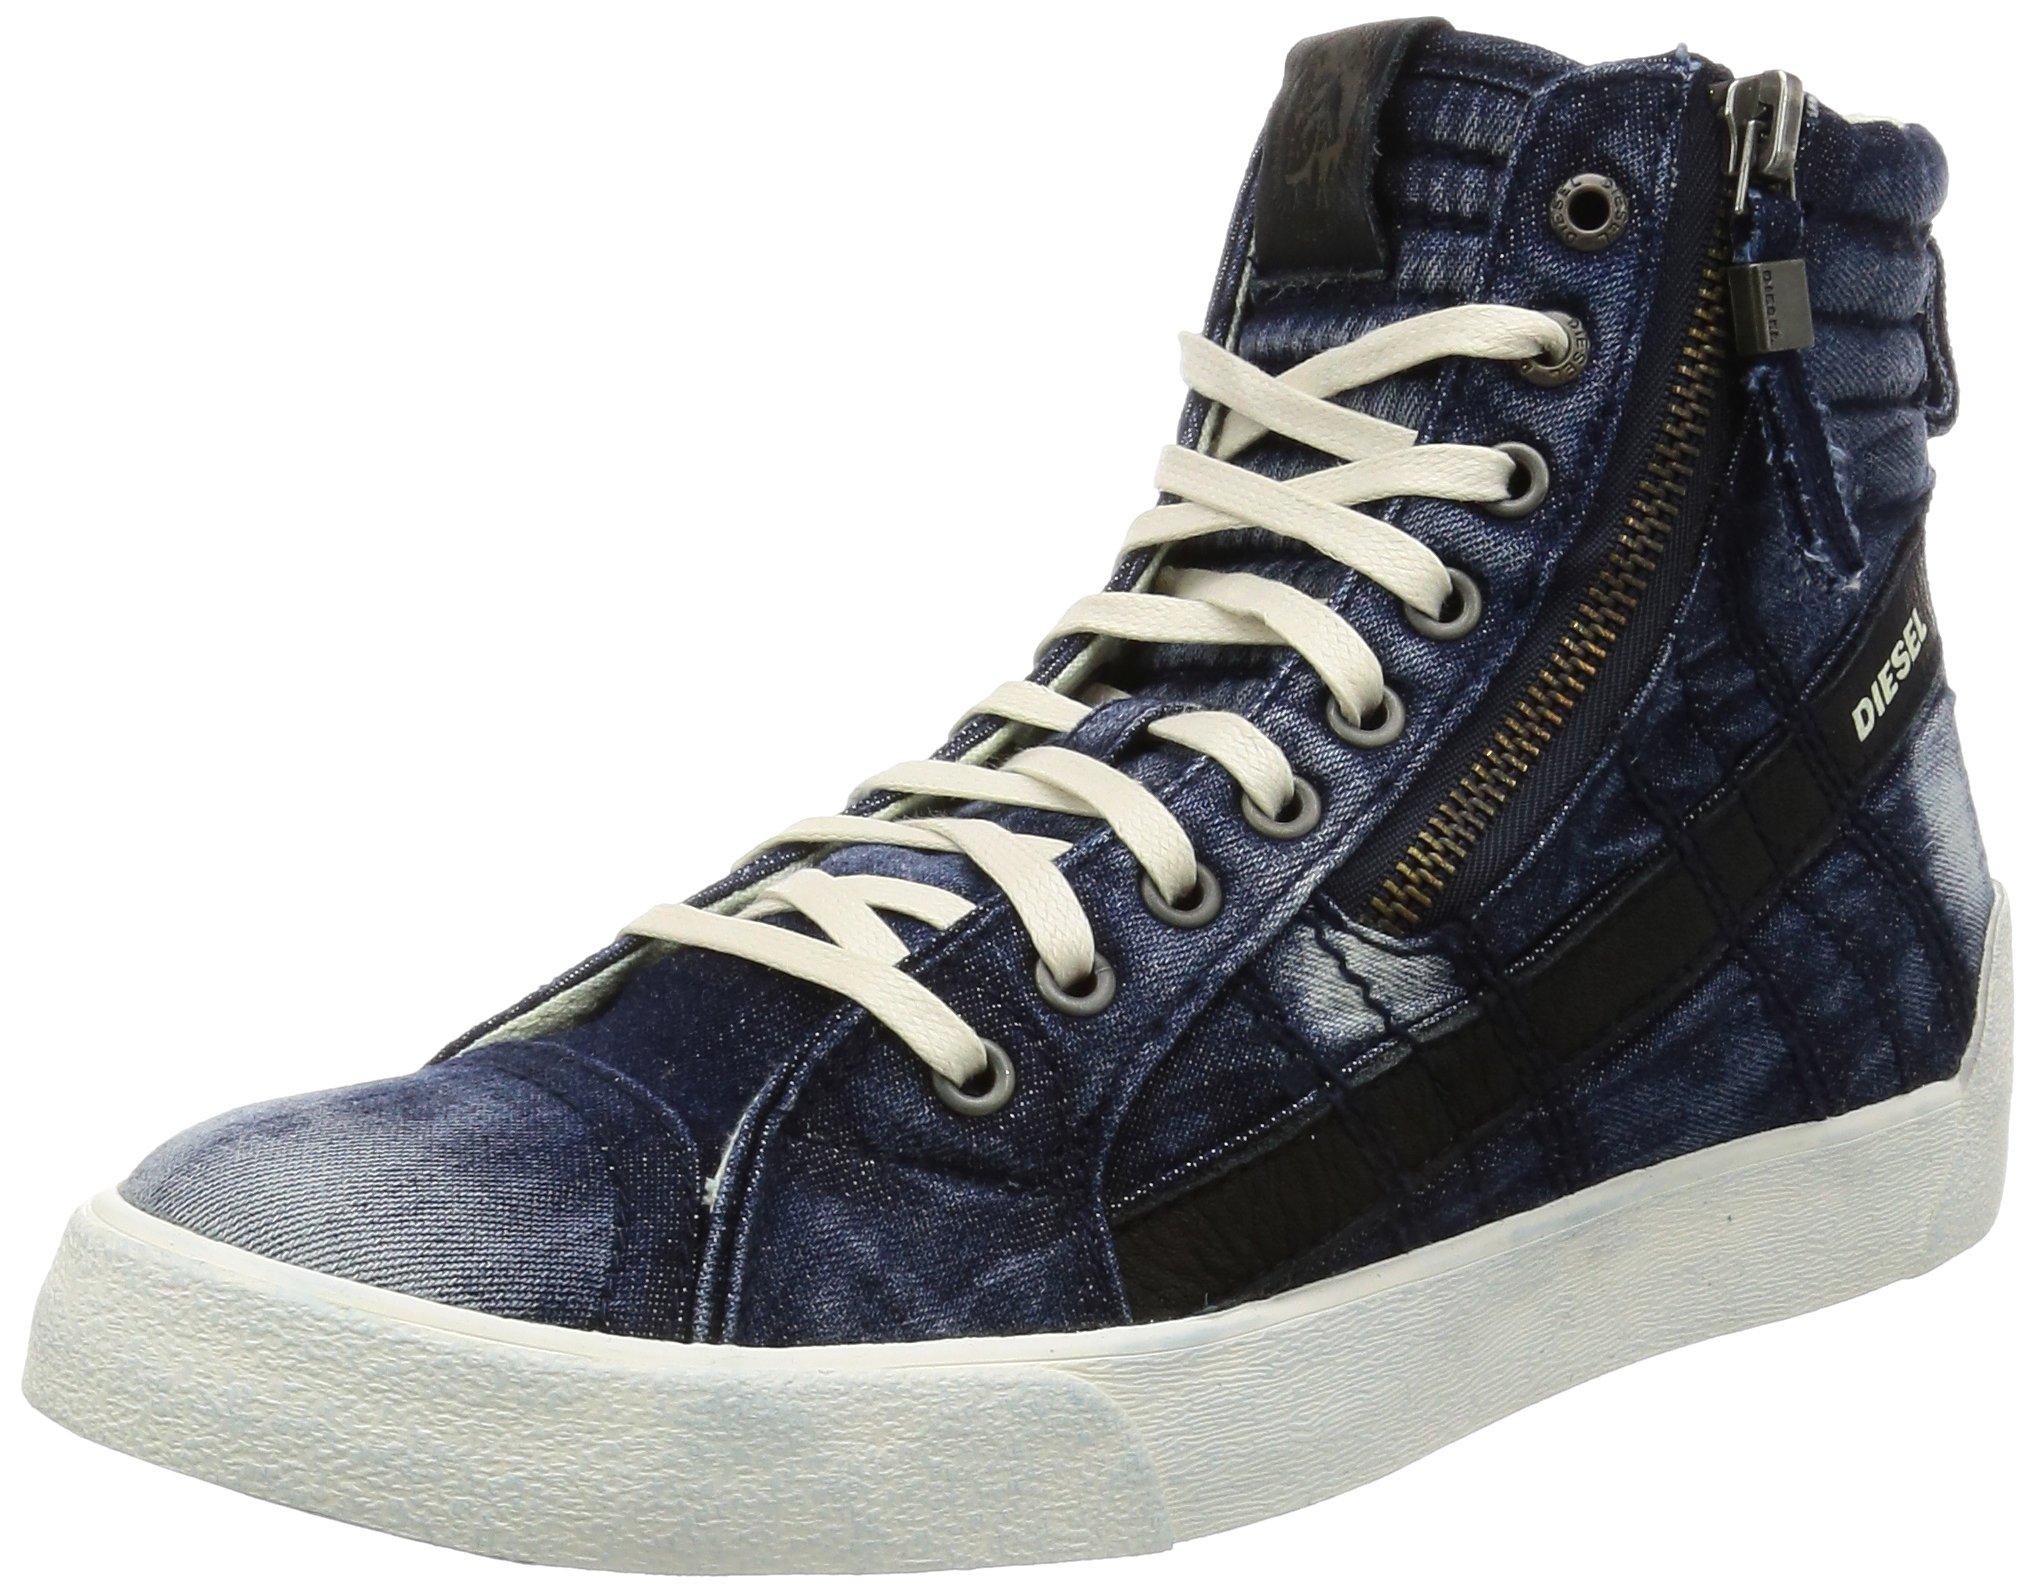 Diesel Men's D-Velows D-String Plus Denim Fashion Sneaker, Indigo, 10.5 M US